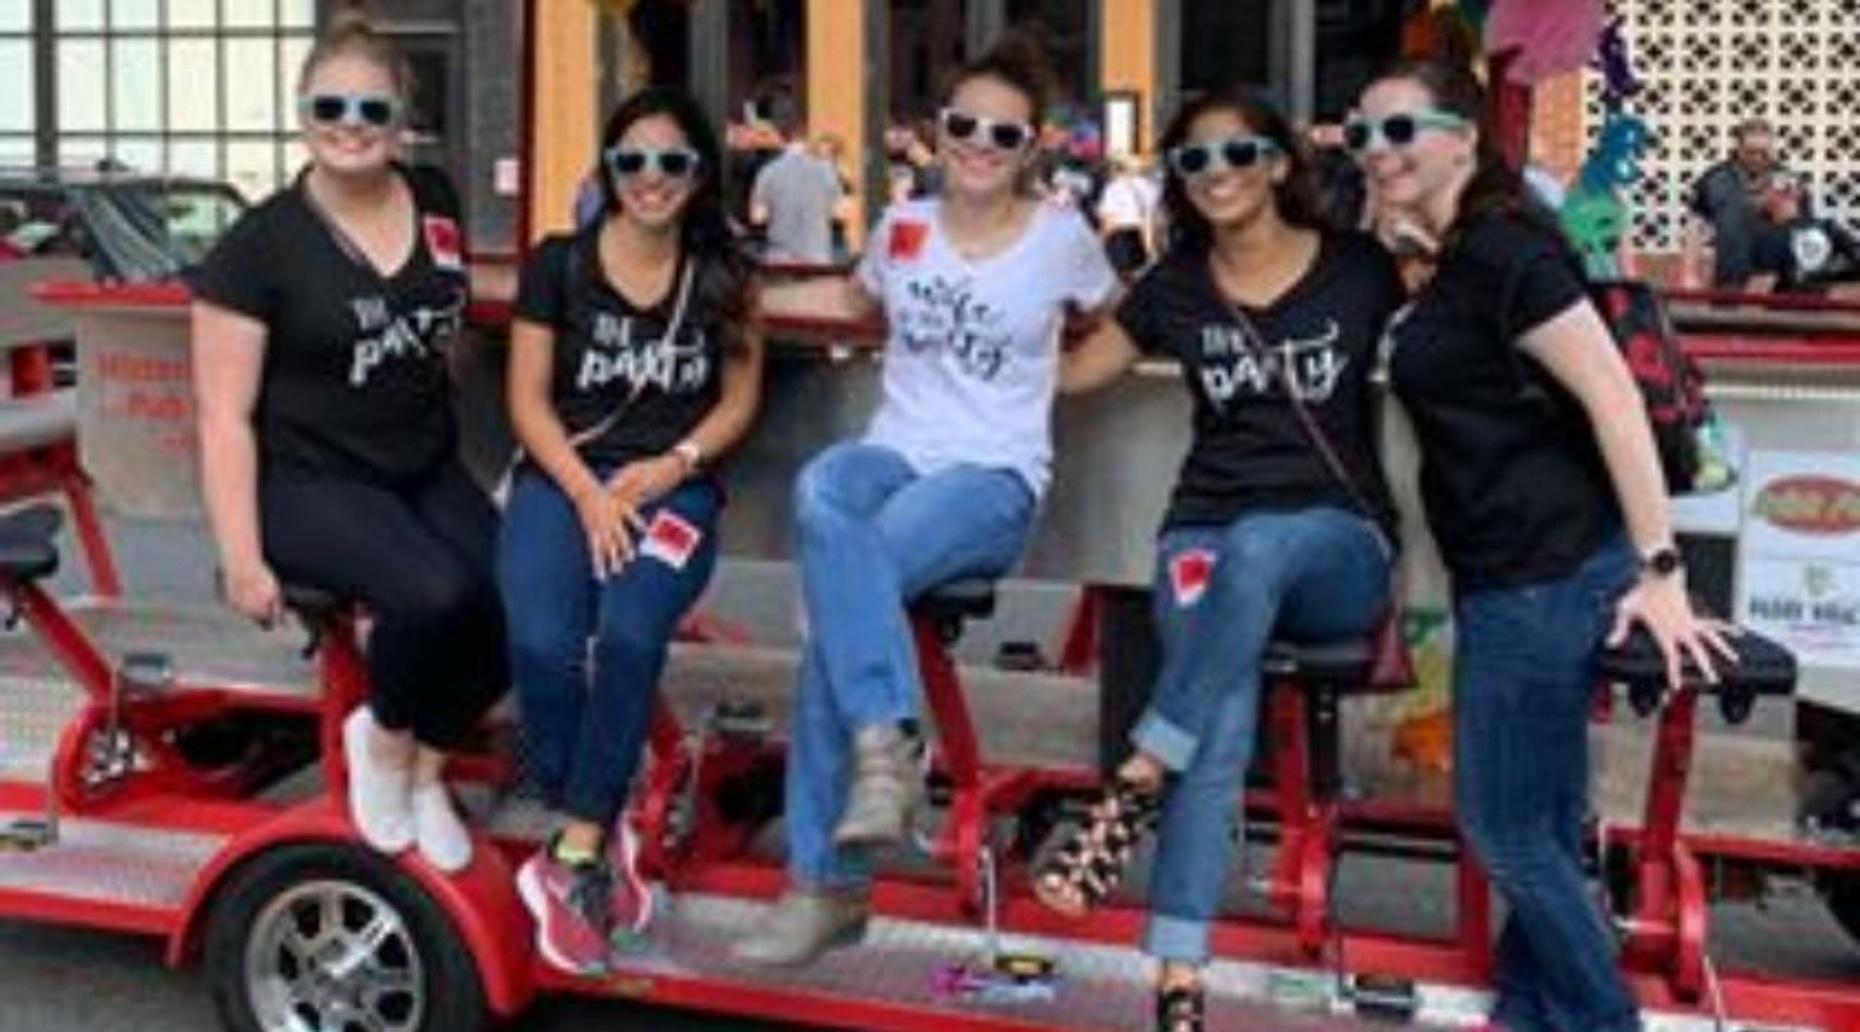 Fishtown Pub Crawl Pedal Tour in Philadelphia